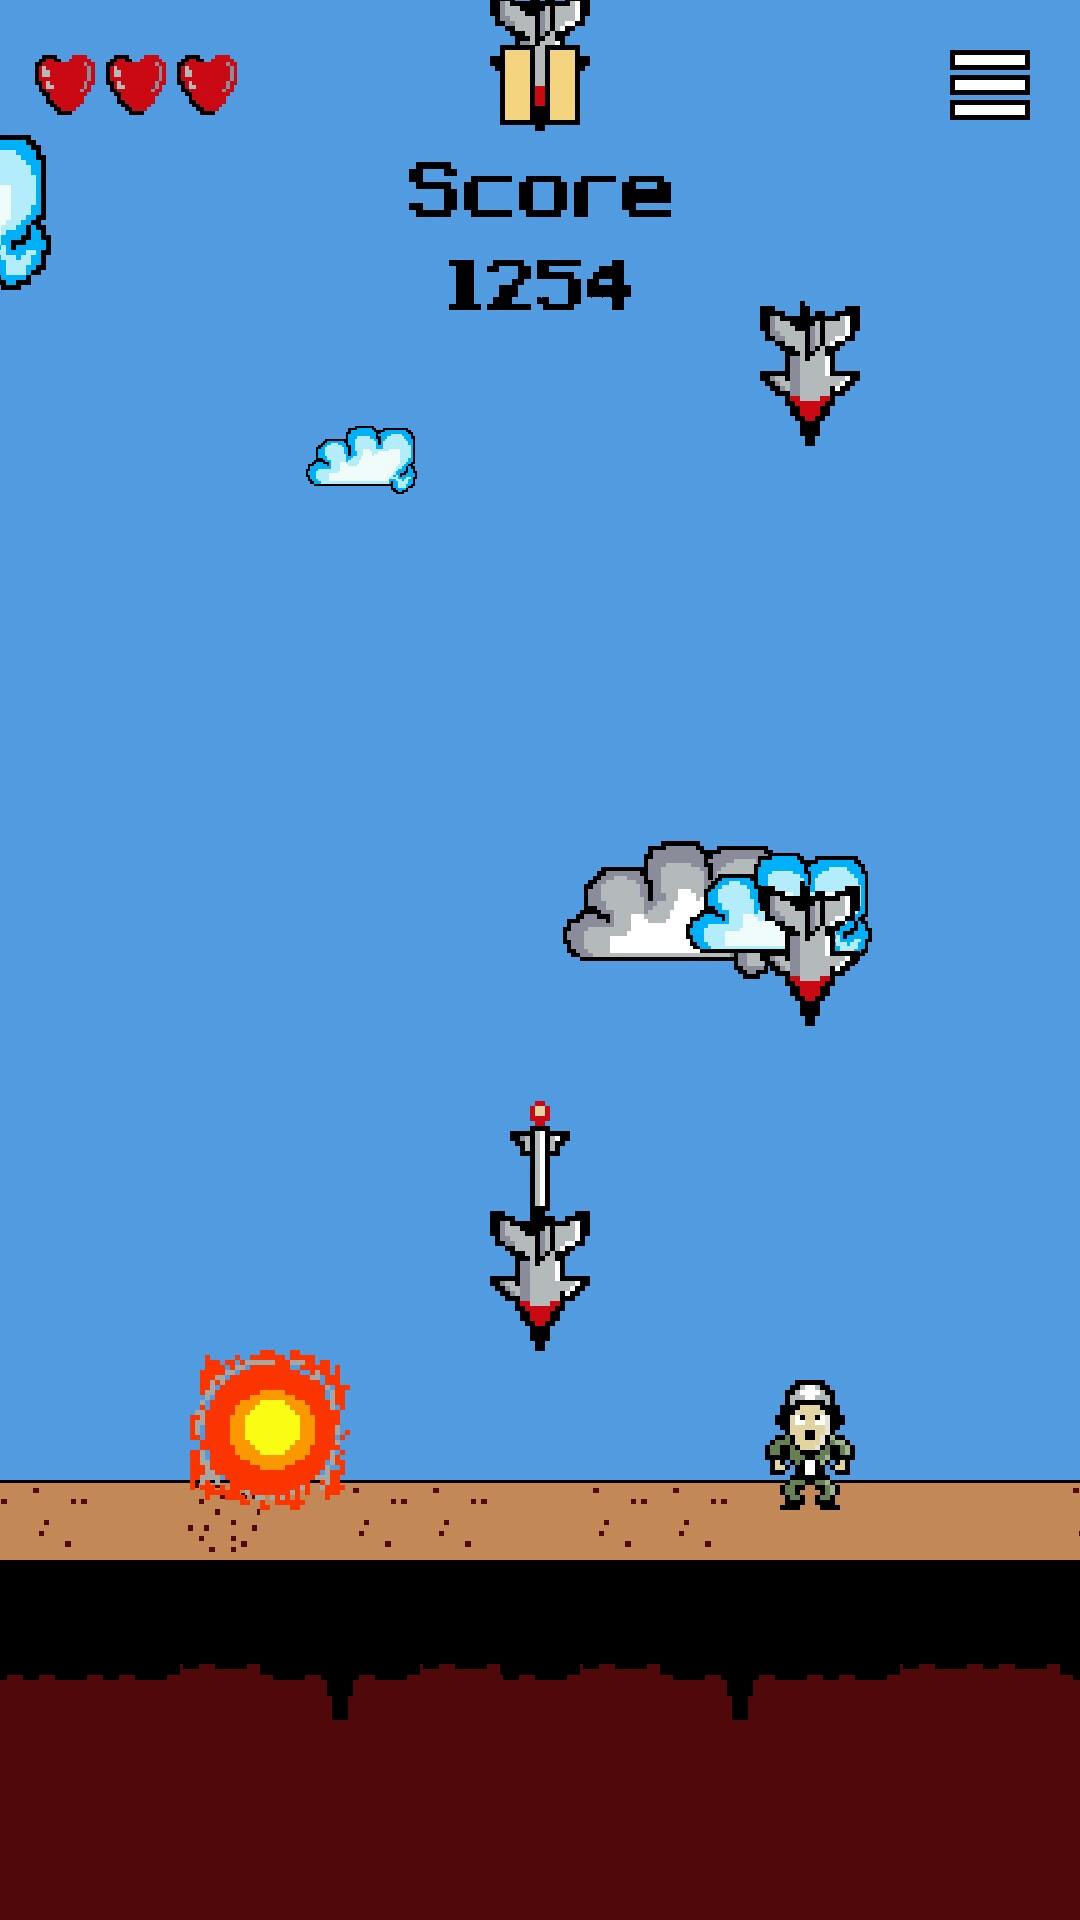 Bomb Rush - minimalist pixel art game [Android] - Game/Demo